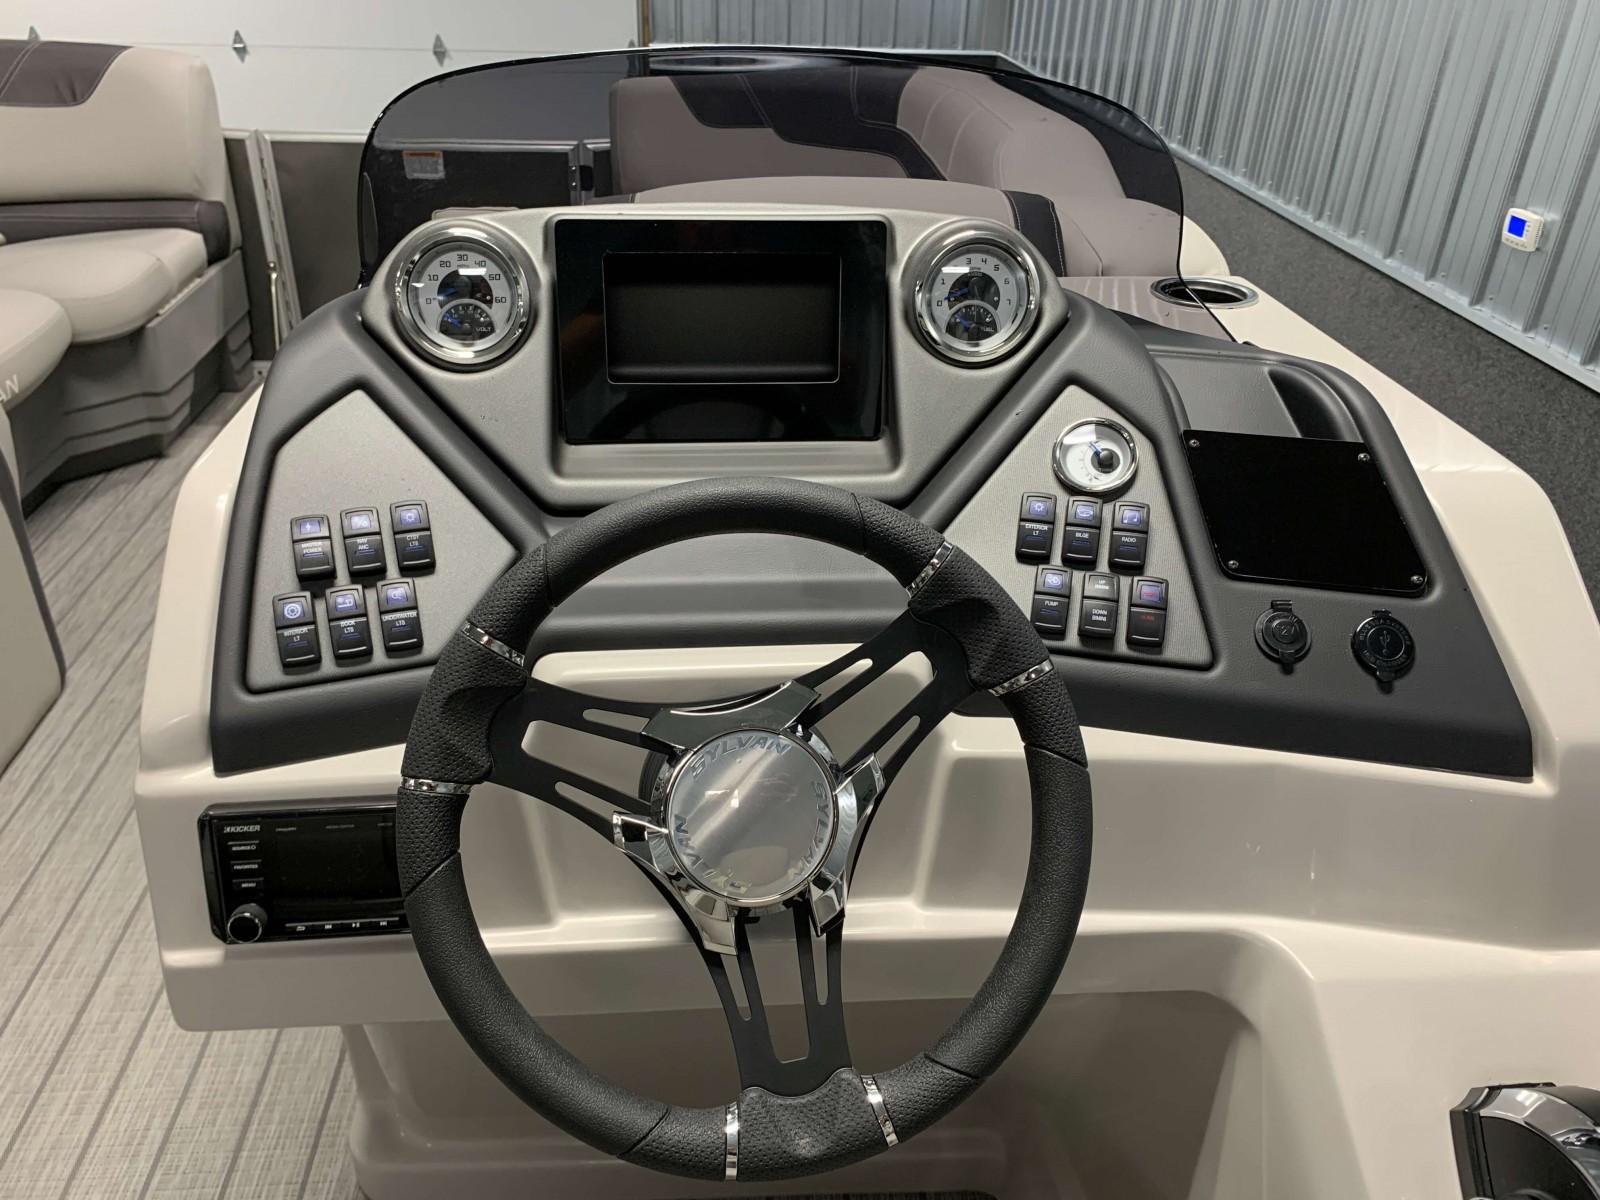 Drivers Console of a 2020 Sylvan L3 CLZ Pontoon